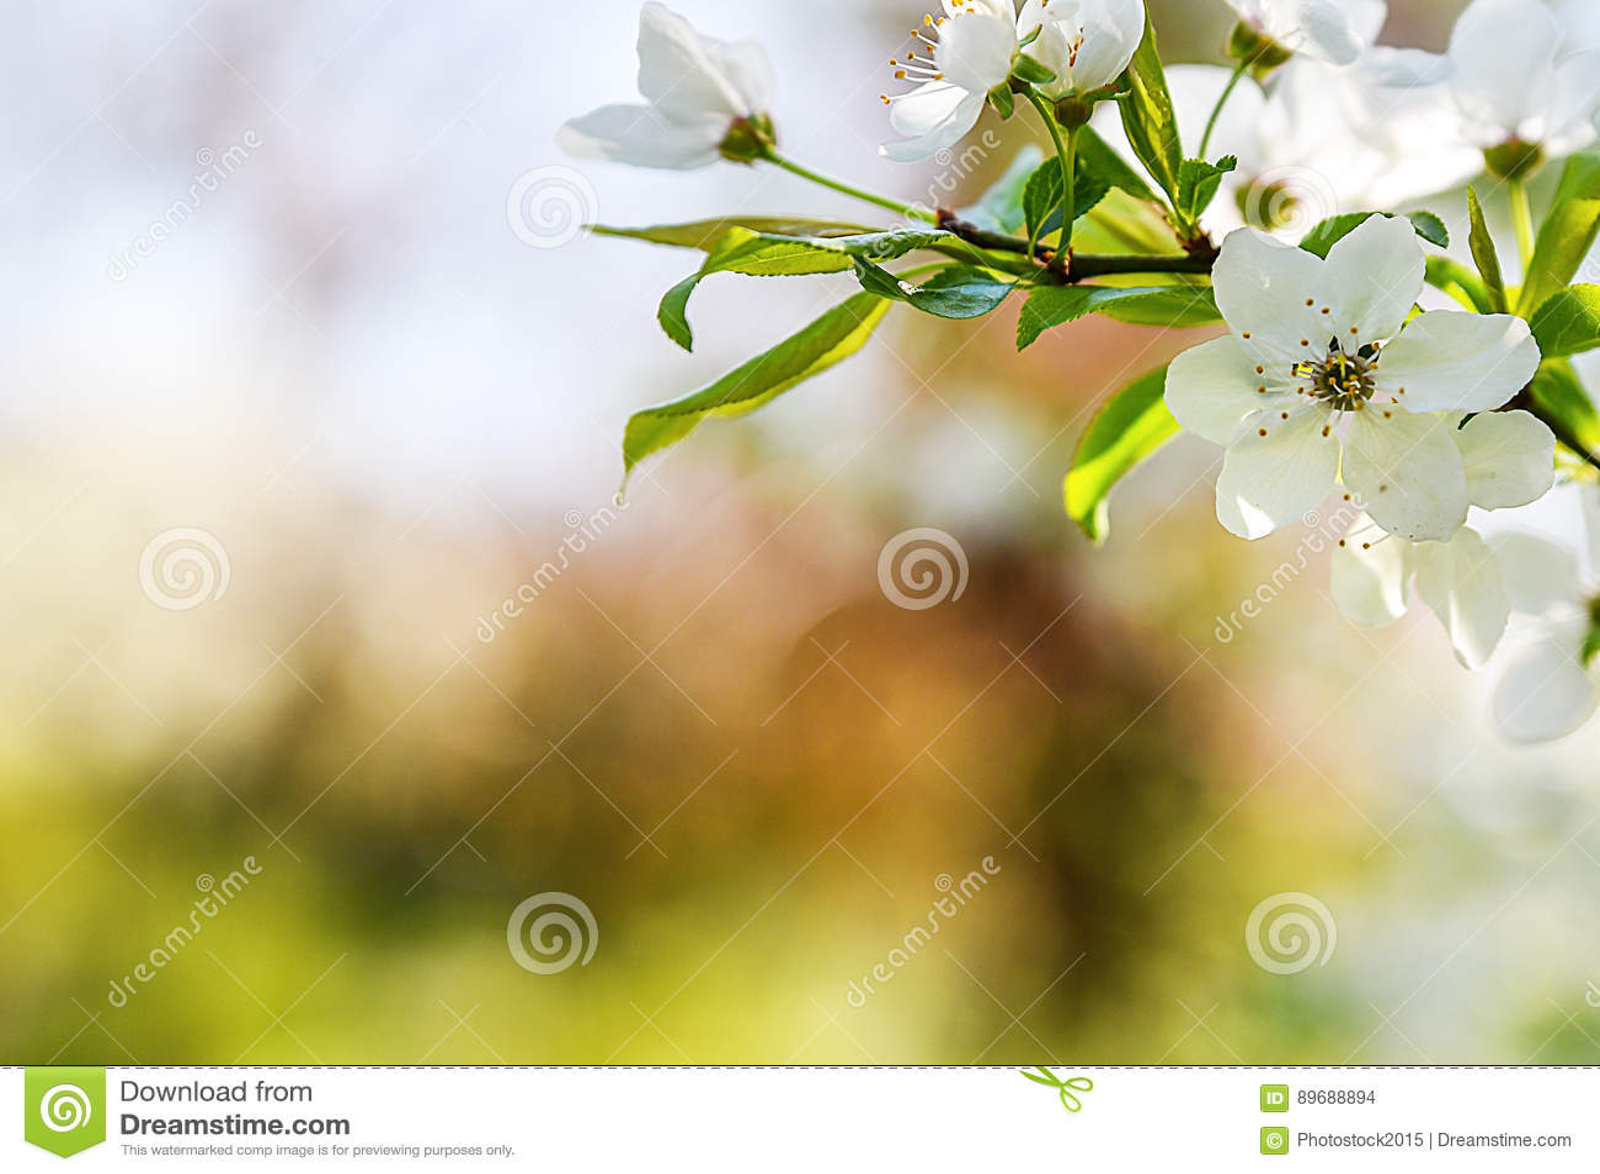 Seasonal Spring Flowers Trees Background Stock Photo Image Of